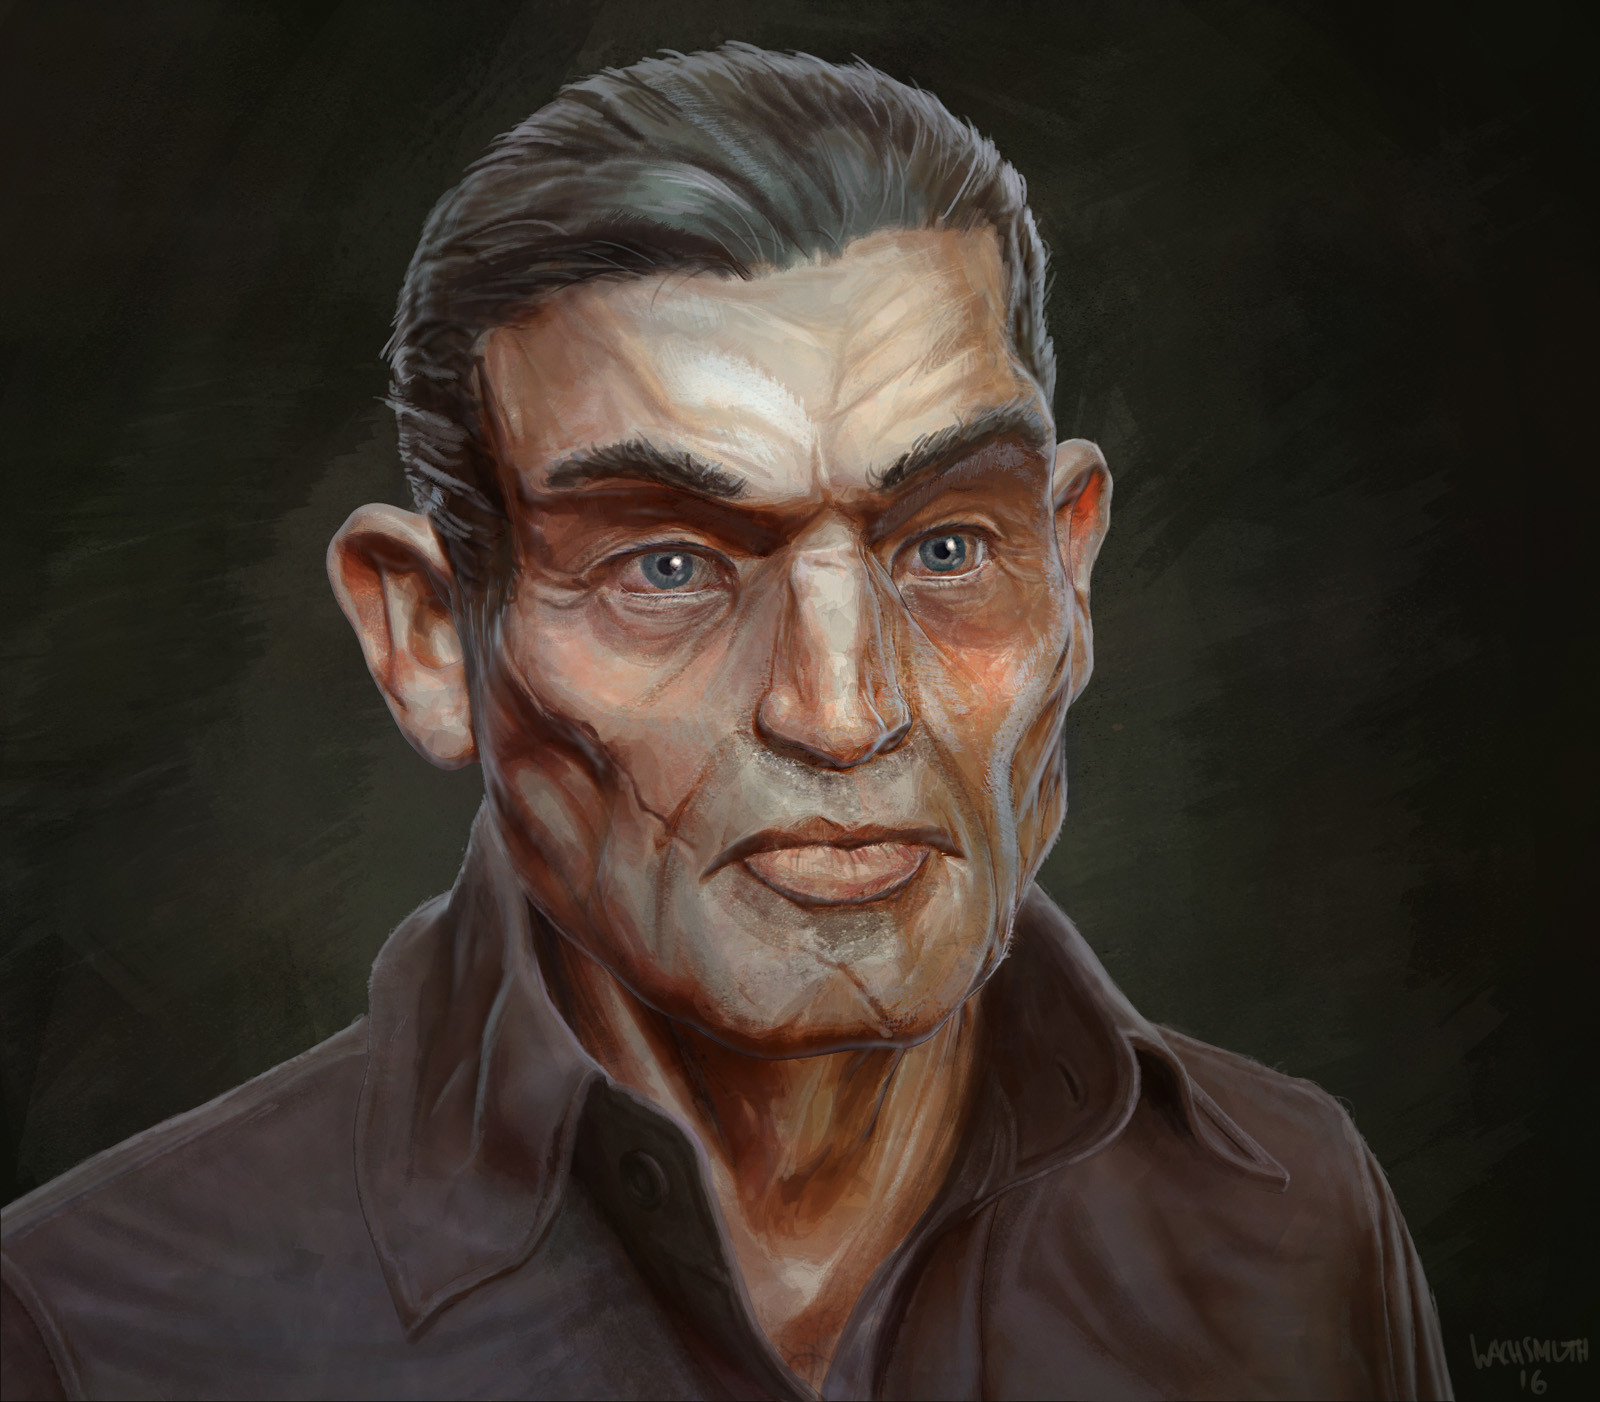 Dirk wachsmuth jona concept portrait 4web